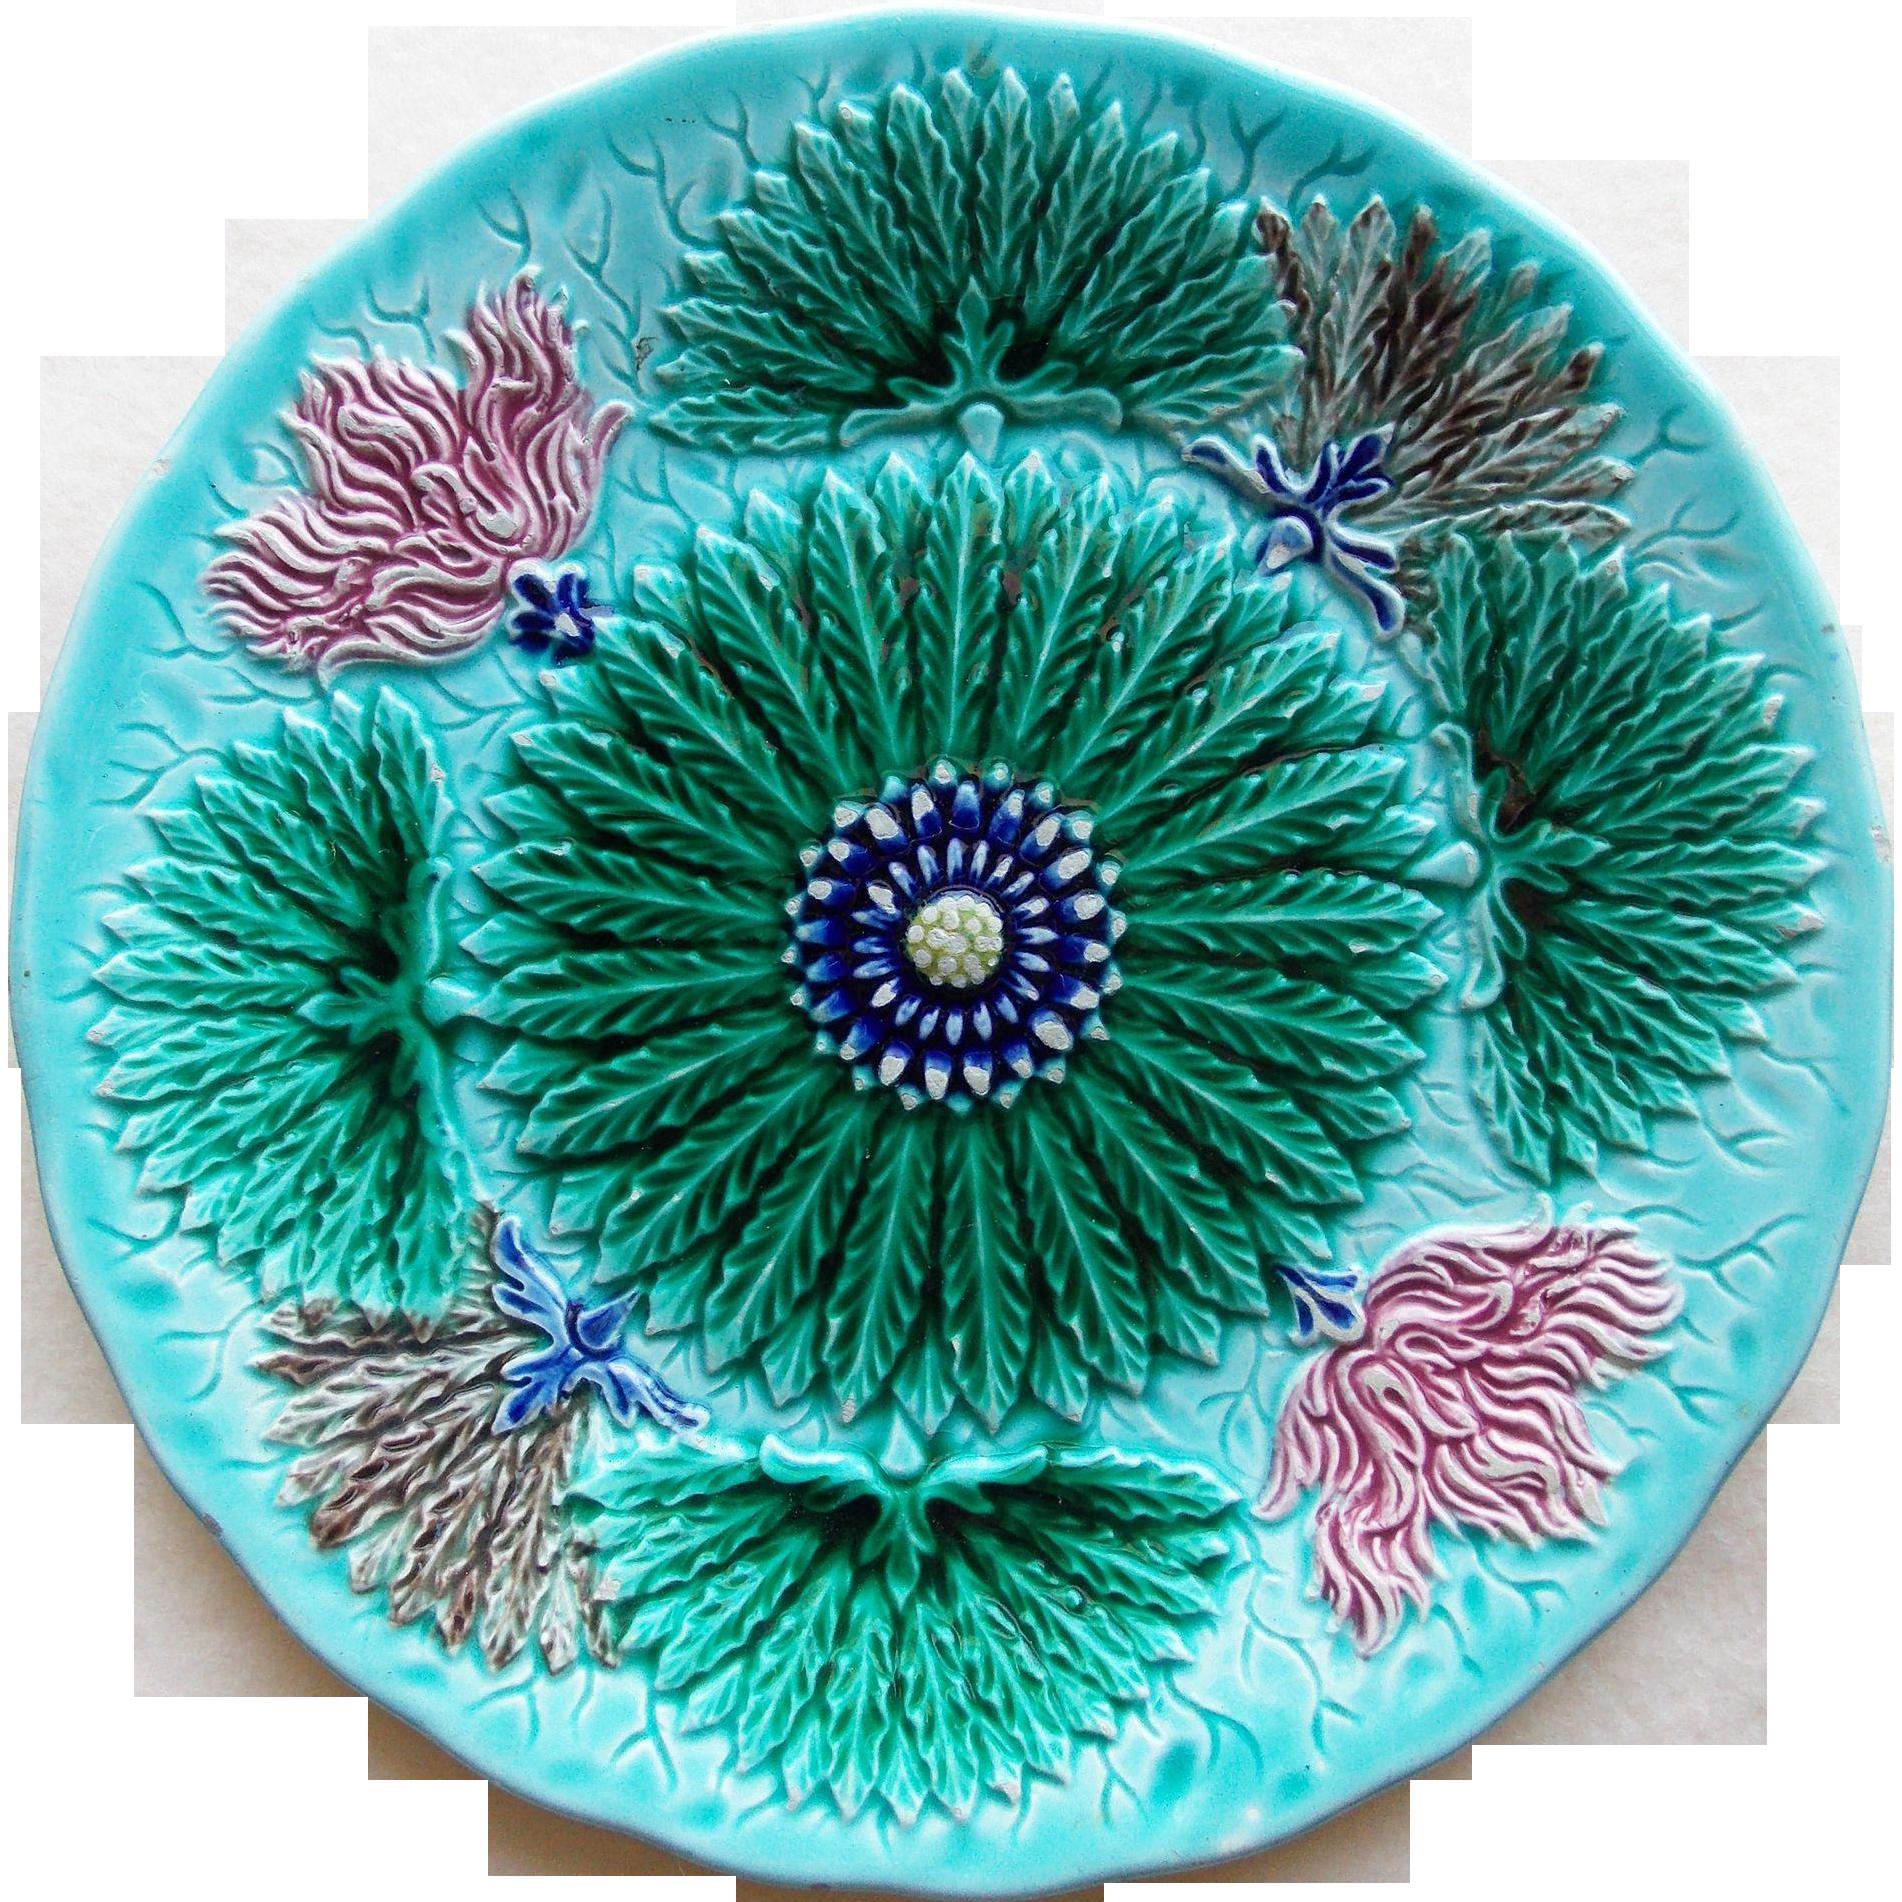 French Majolica Floral Design Antique Plate - Utzschneider & Cie at Sarreguemines France